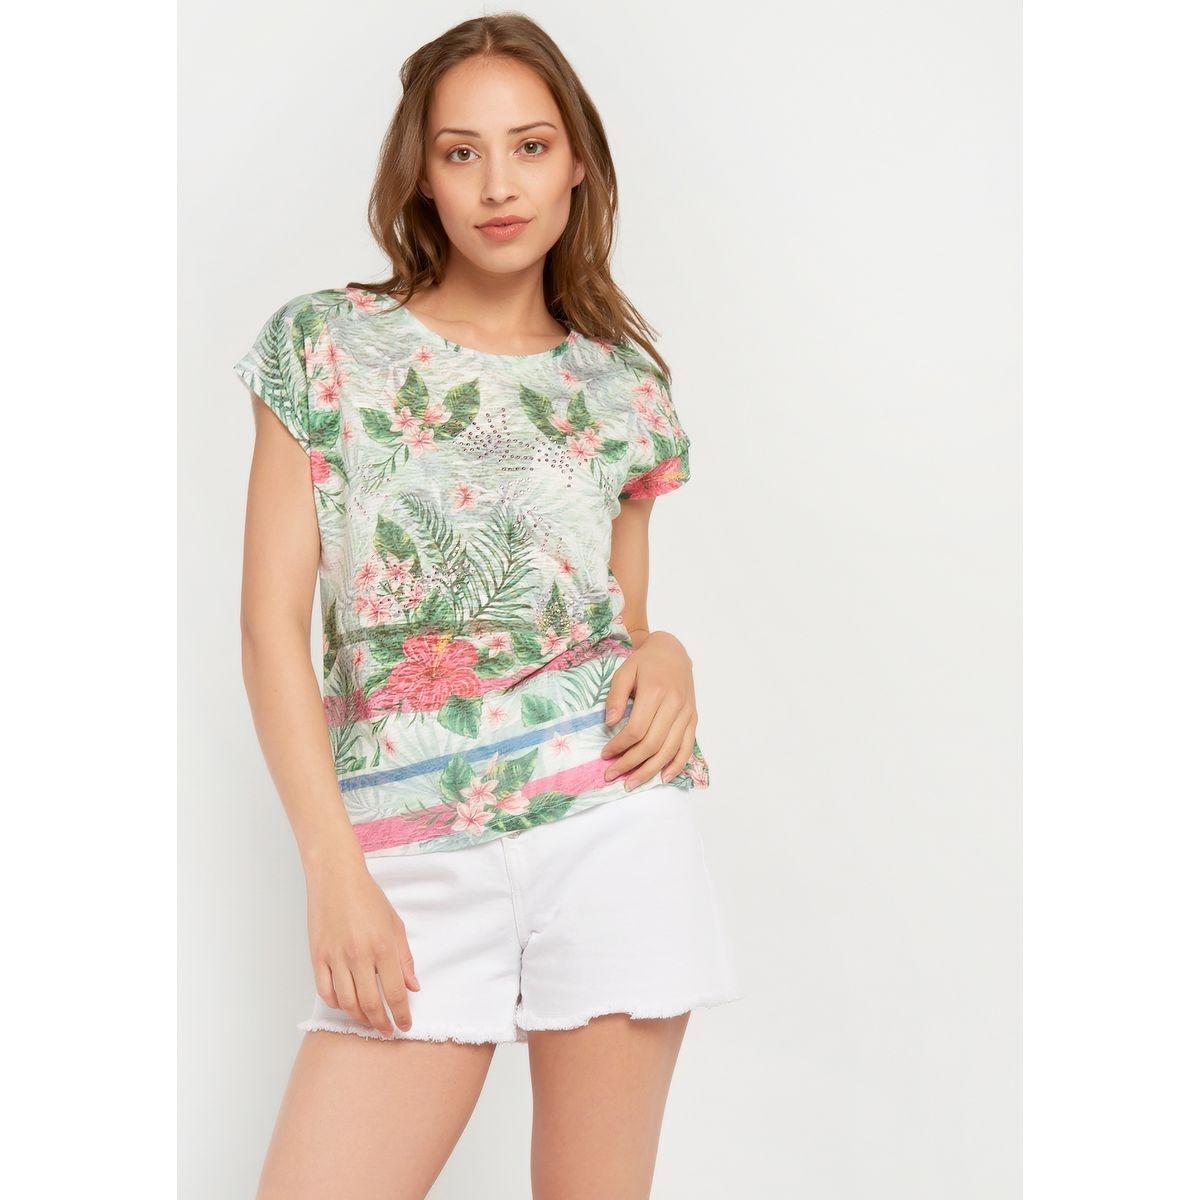 T-shirt imprimé tropical, strass